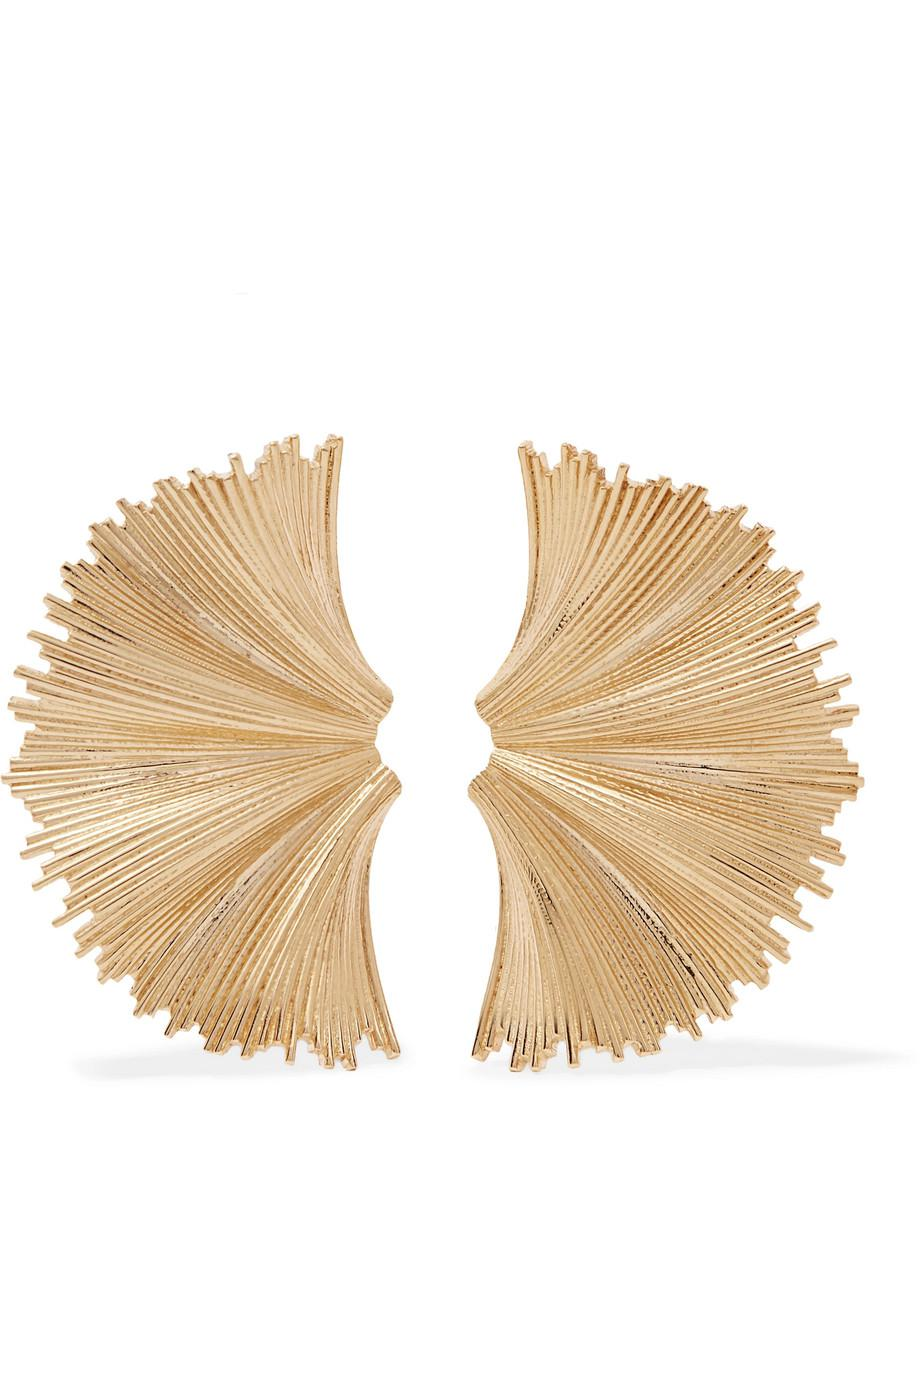 Meadowlark Vita Gold-plated Earrings l4SSriL